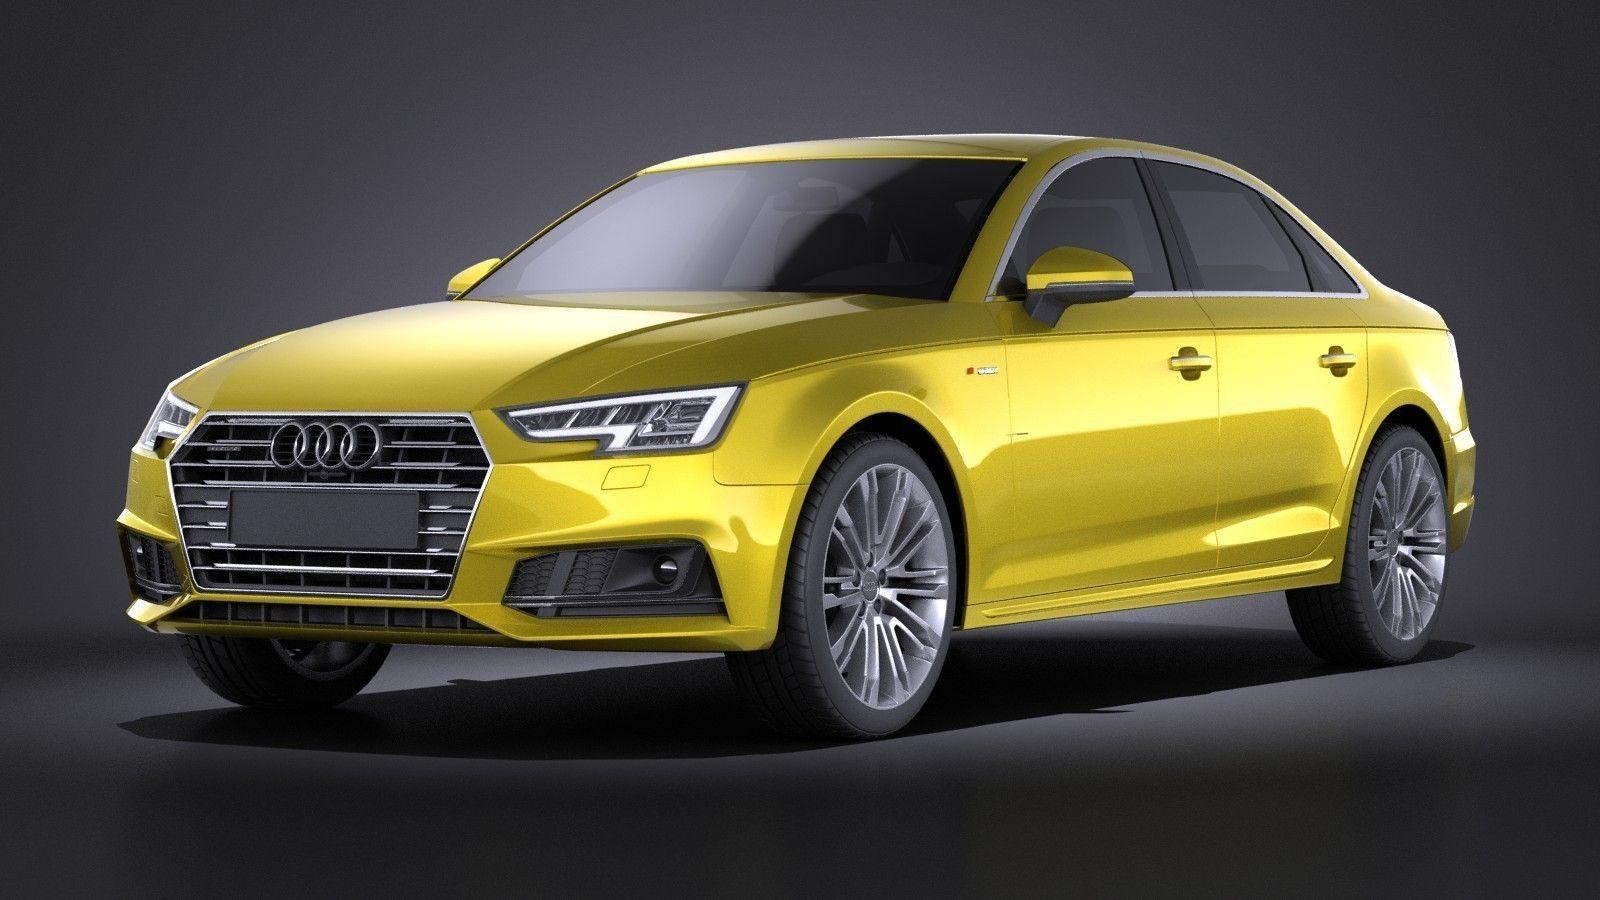 Audi A4 S-Line Sedan 2016 VRAY